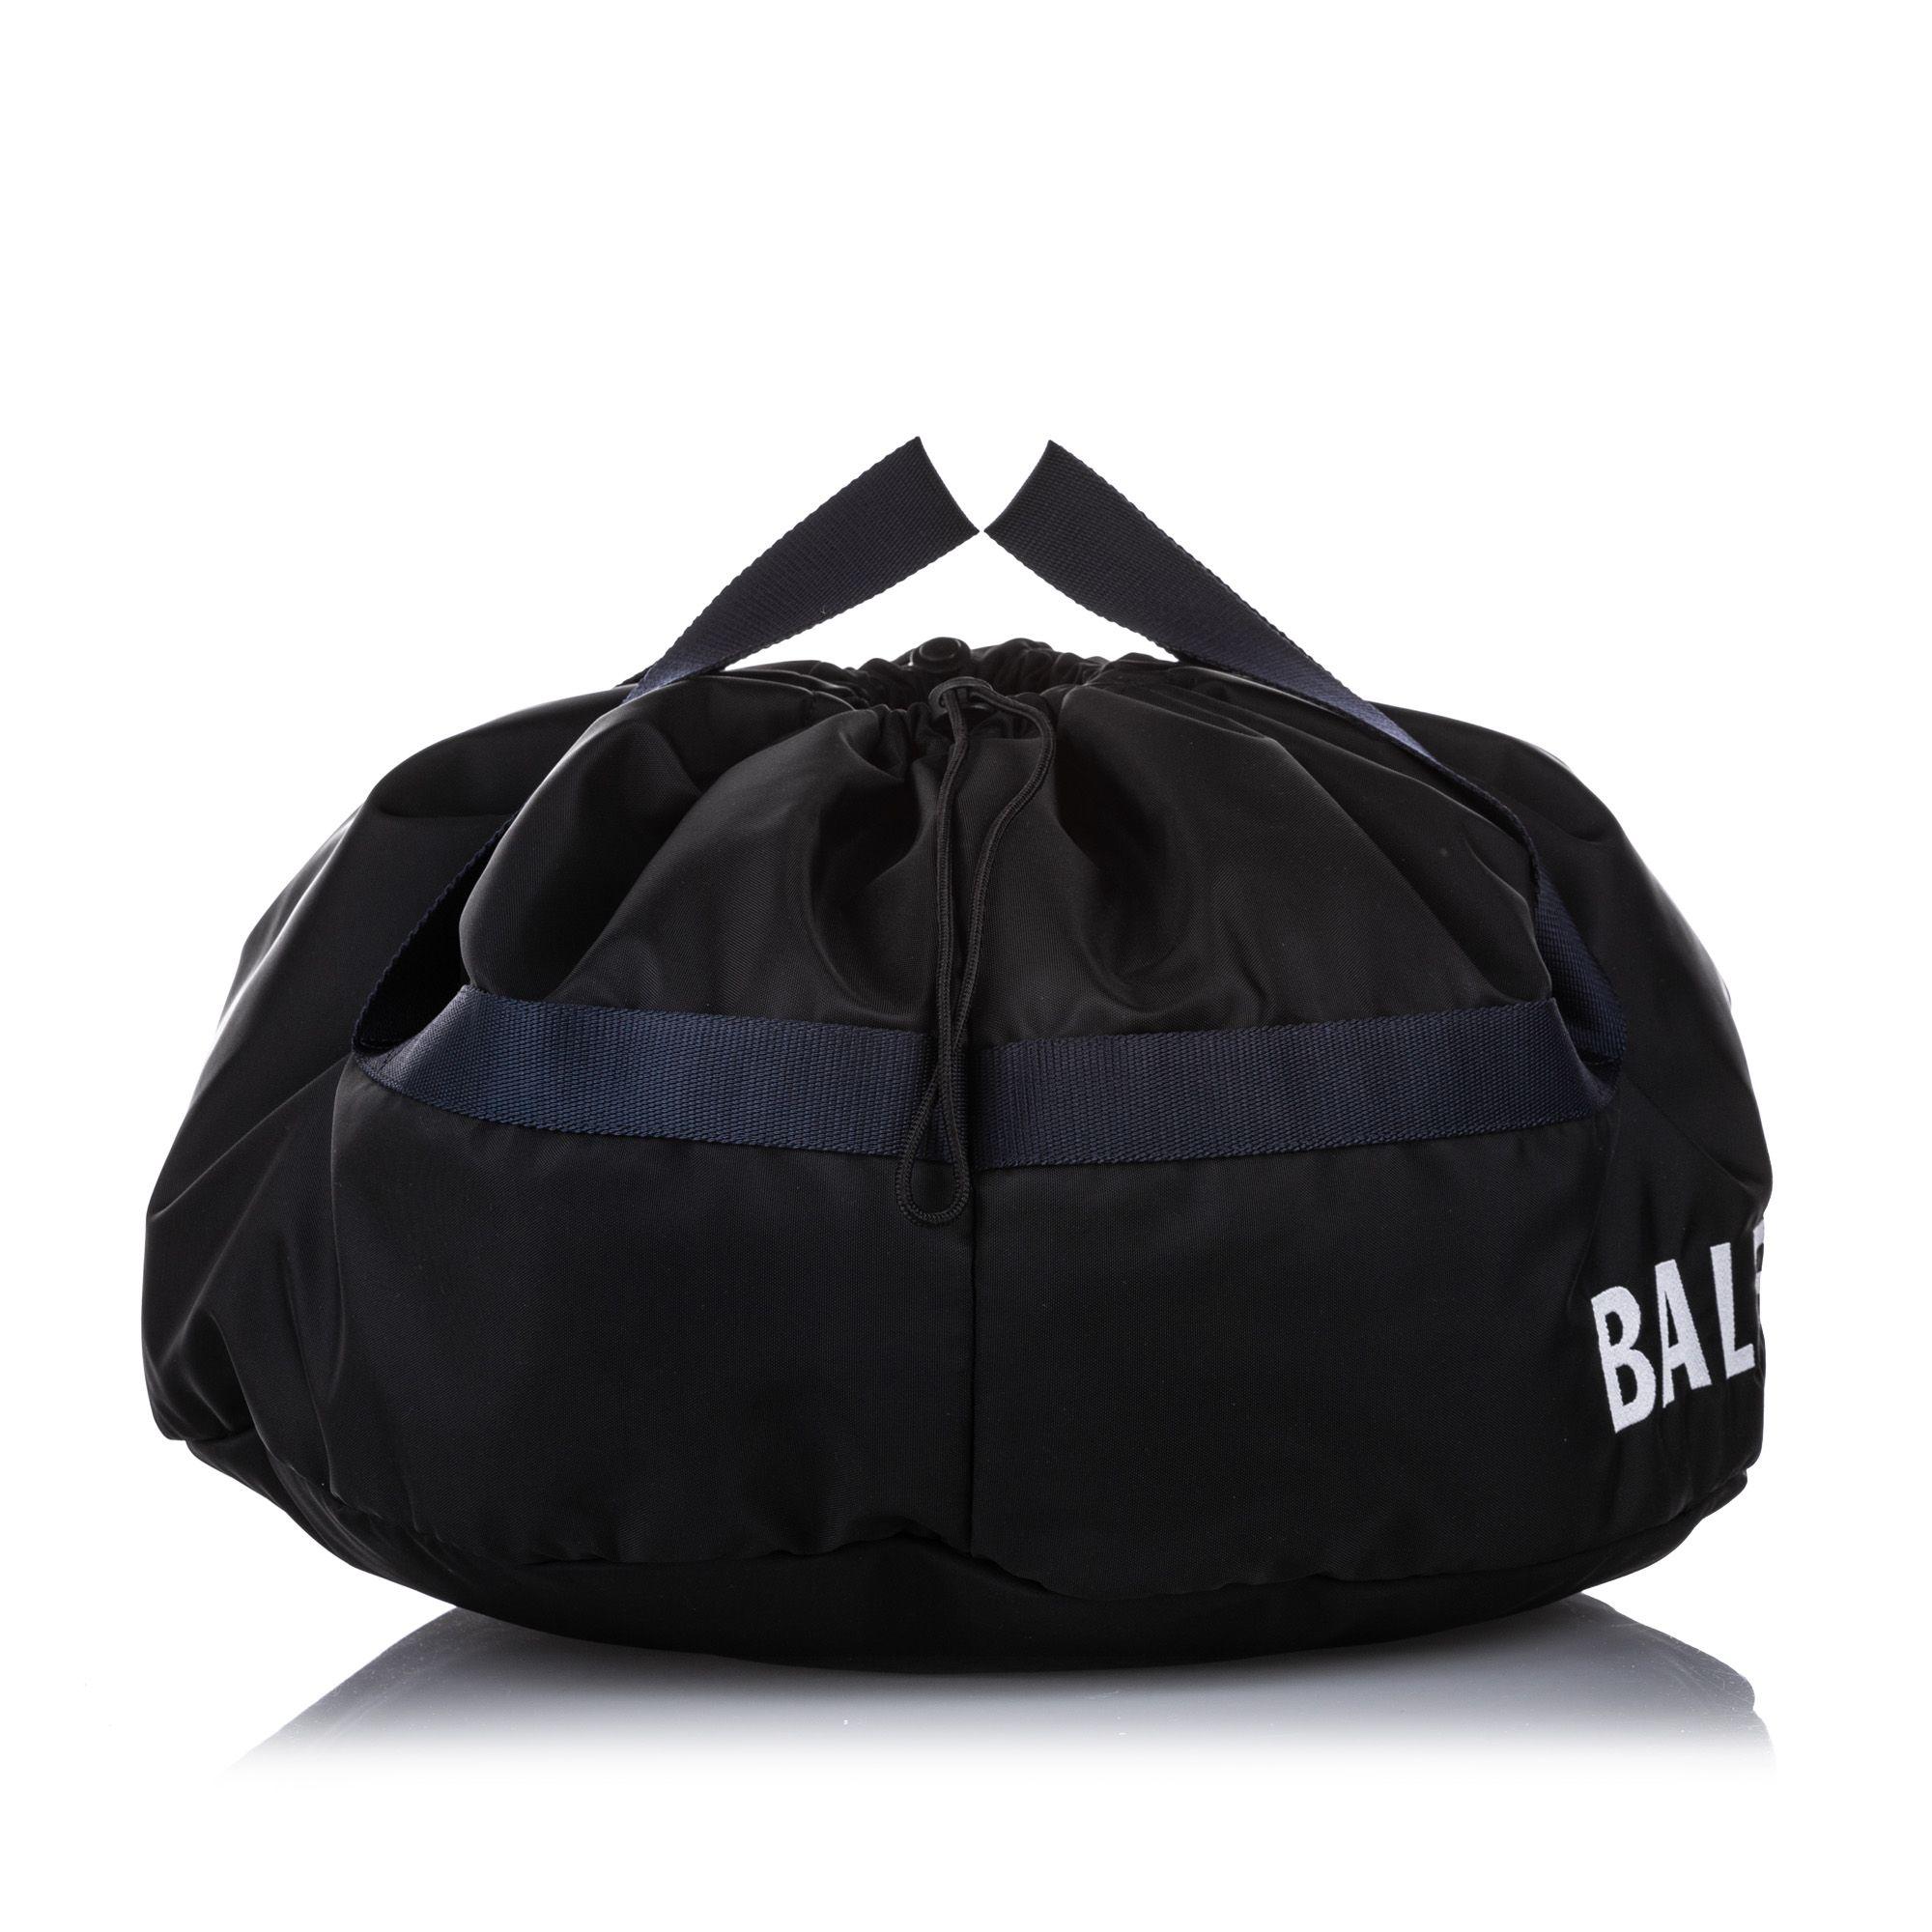 Vintage Balenciaga S Wheel Everyday Nylon Travel Bag Black